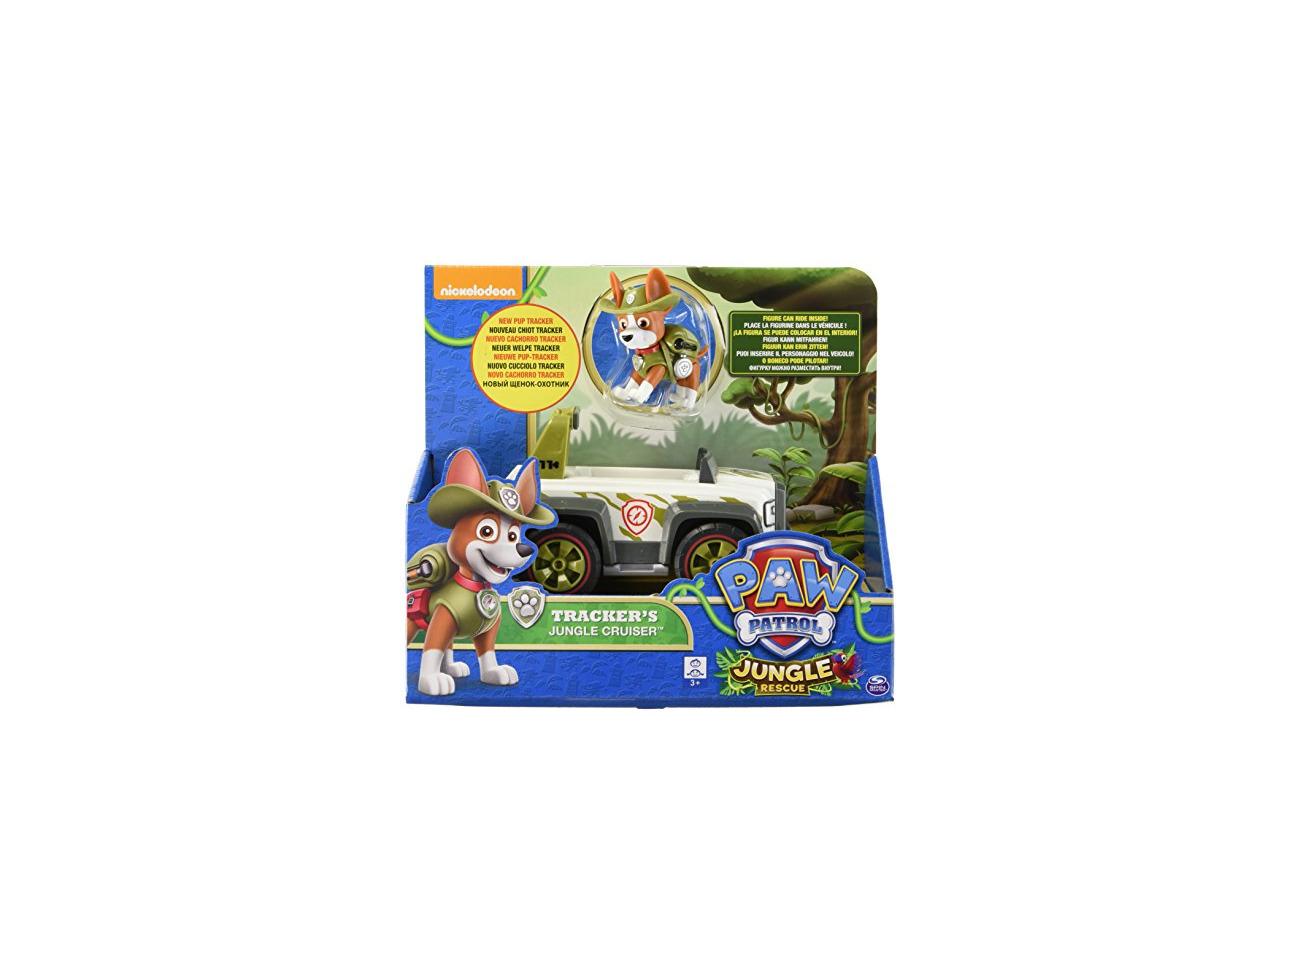 PAW PATROL Paw VHC BscV Jungle Tracker UPCX GML 6053388 Multi-Colour